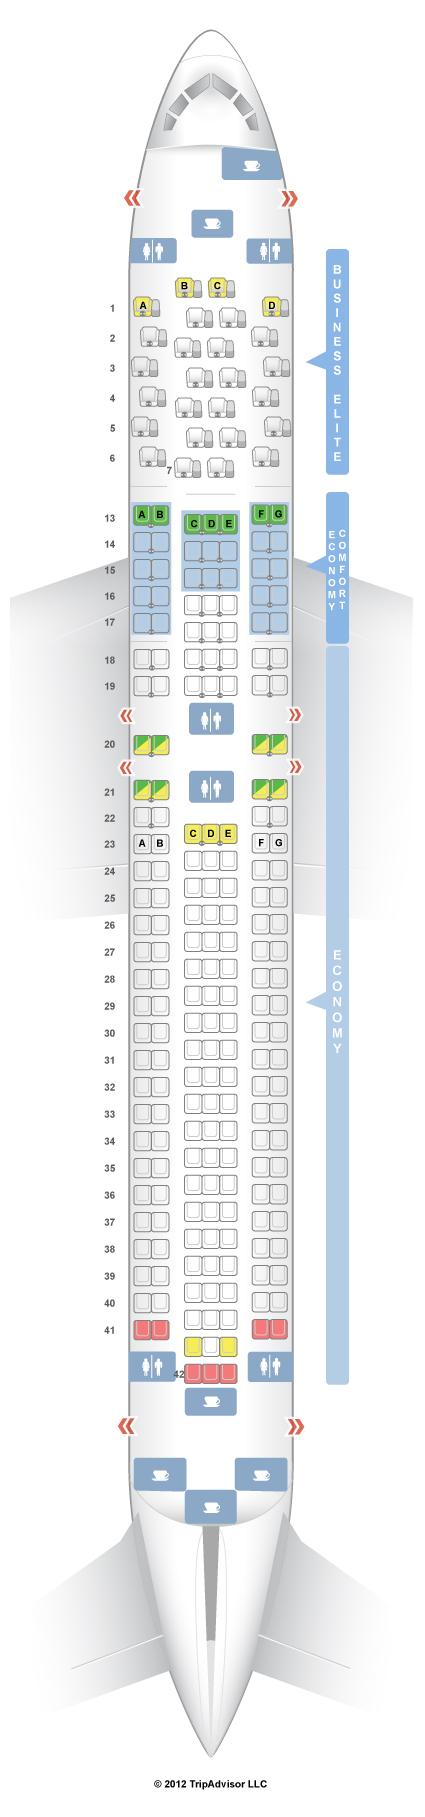 Seatguru seat map delta boeing er   best travel sites also images commercial aircraft air ride aviation rh pinterest